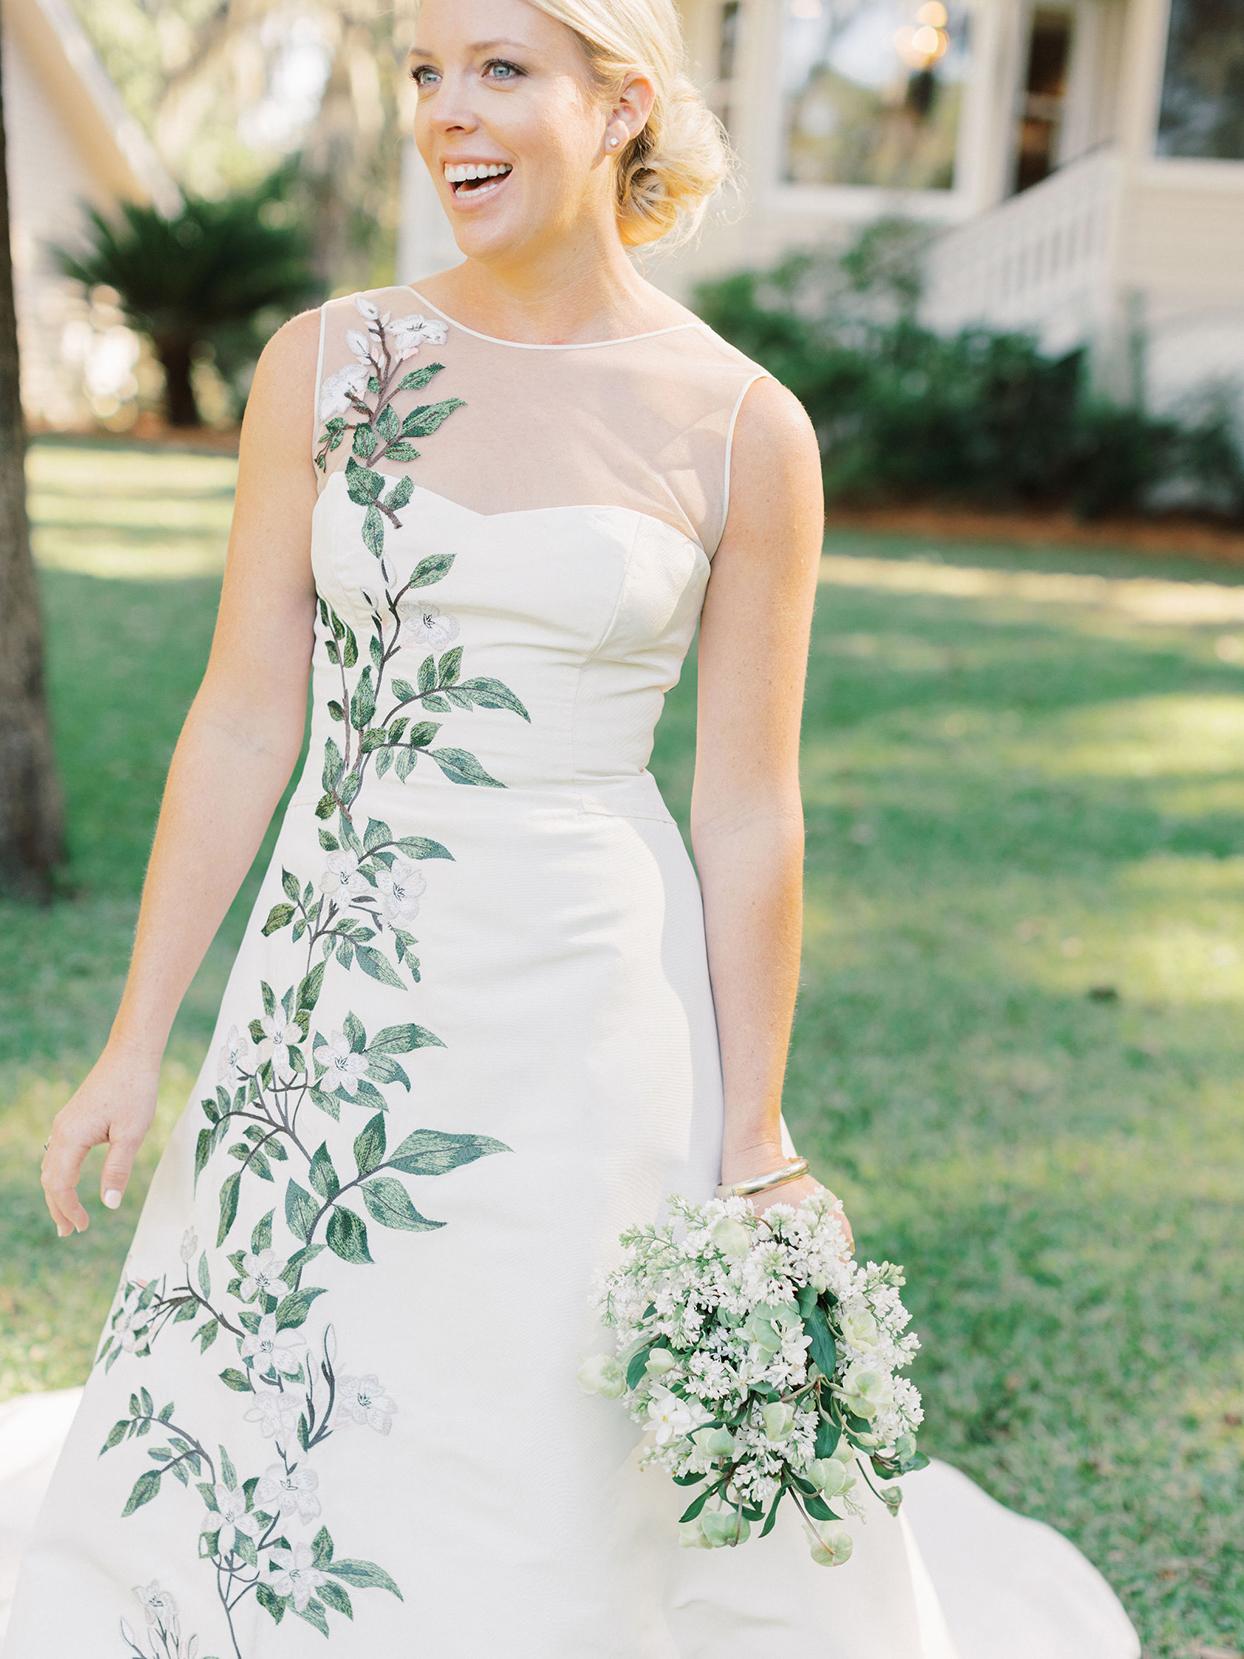 megan parking wedding bride in white dress with vining floral pattern